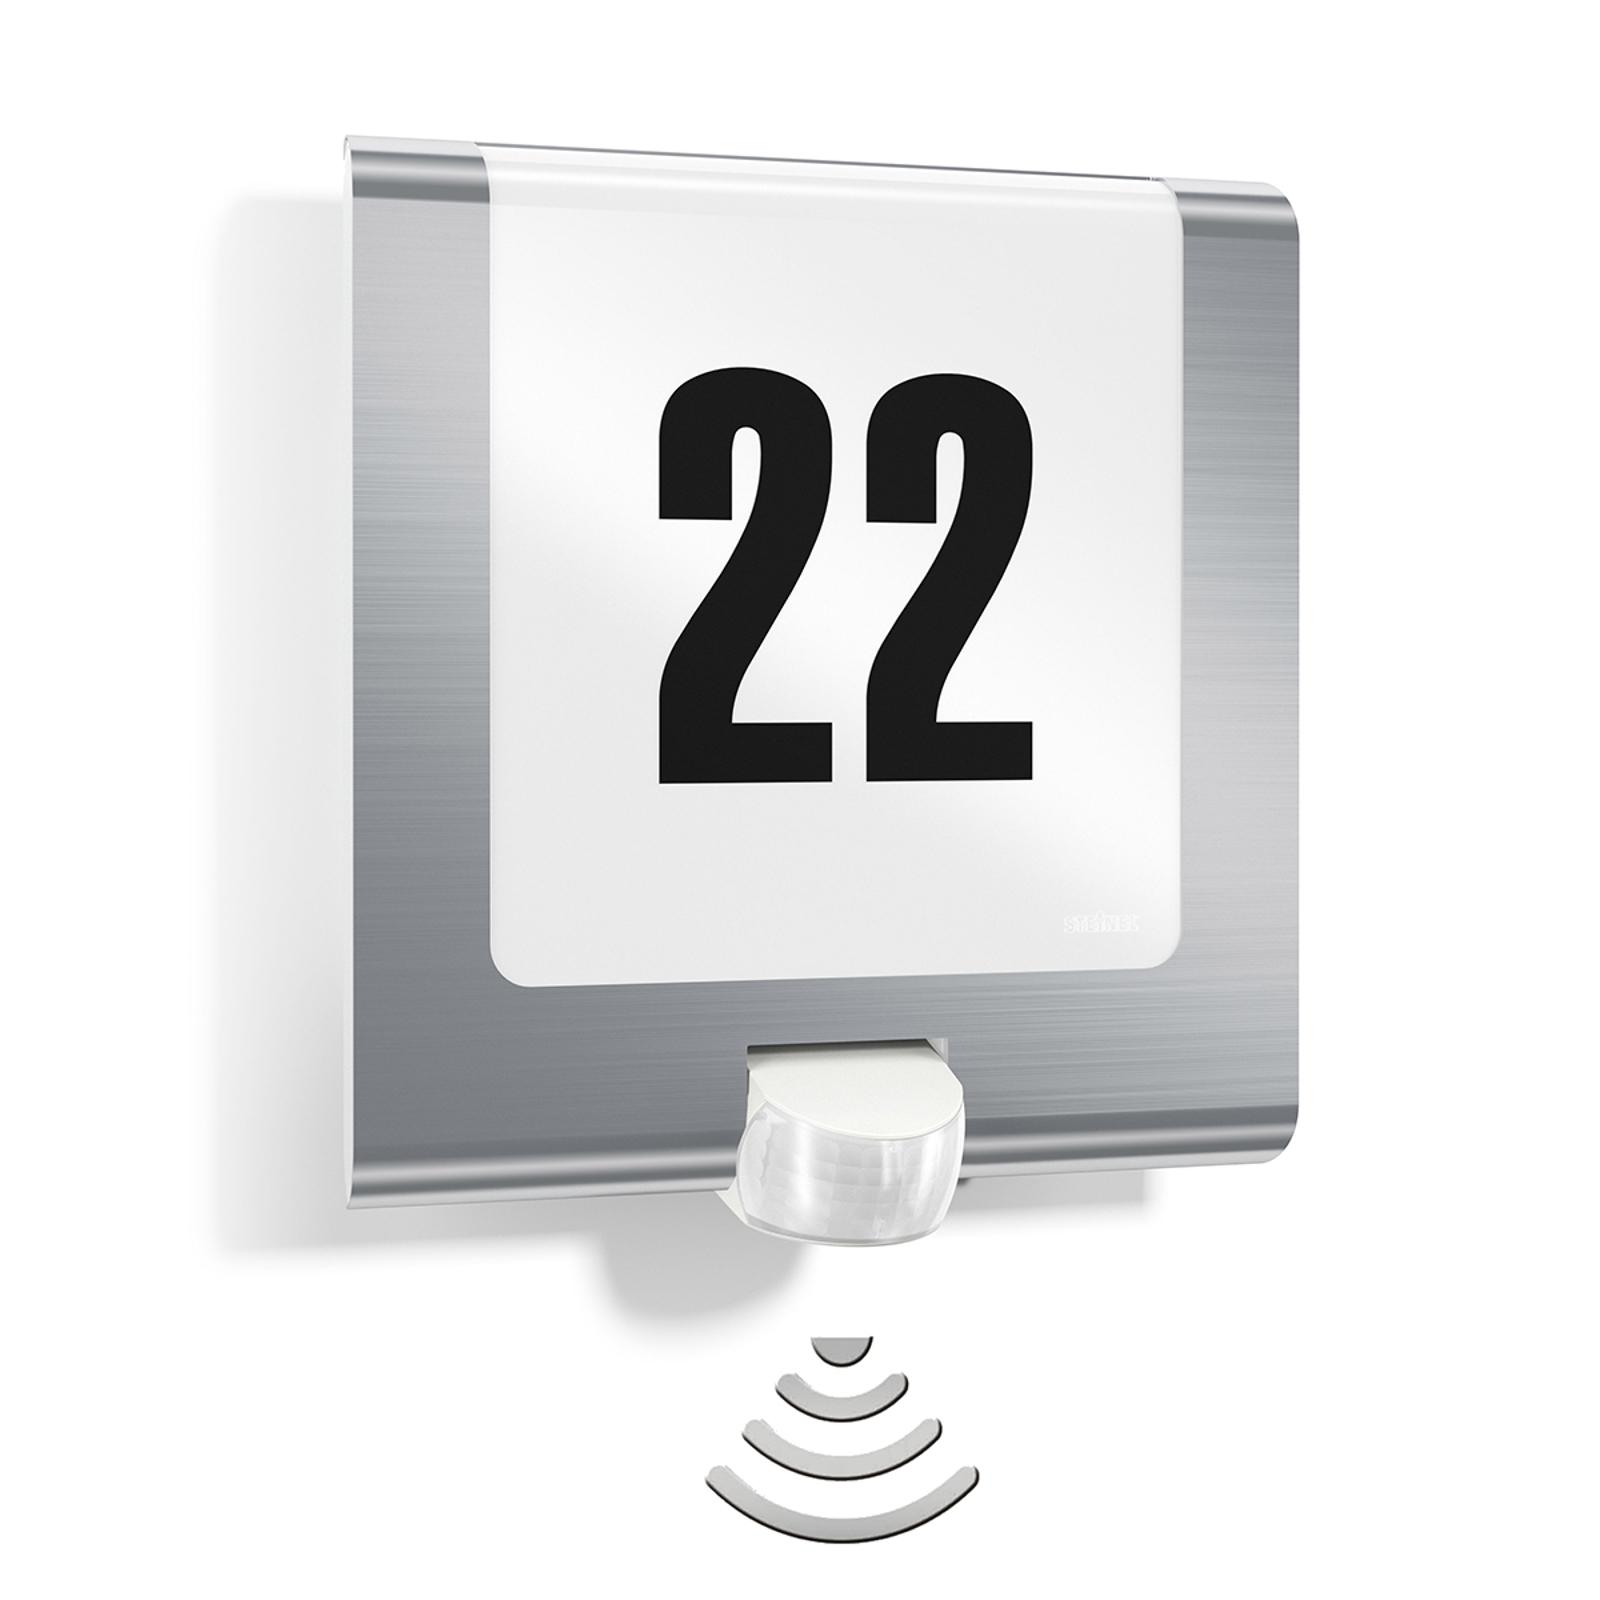 Steinel L220 husnummerlampe, infrarød sensor